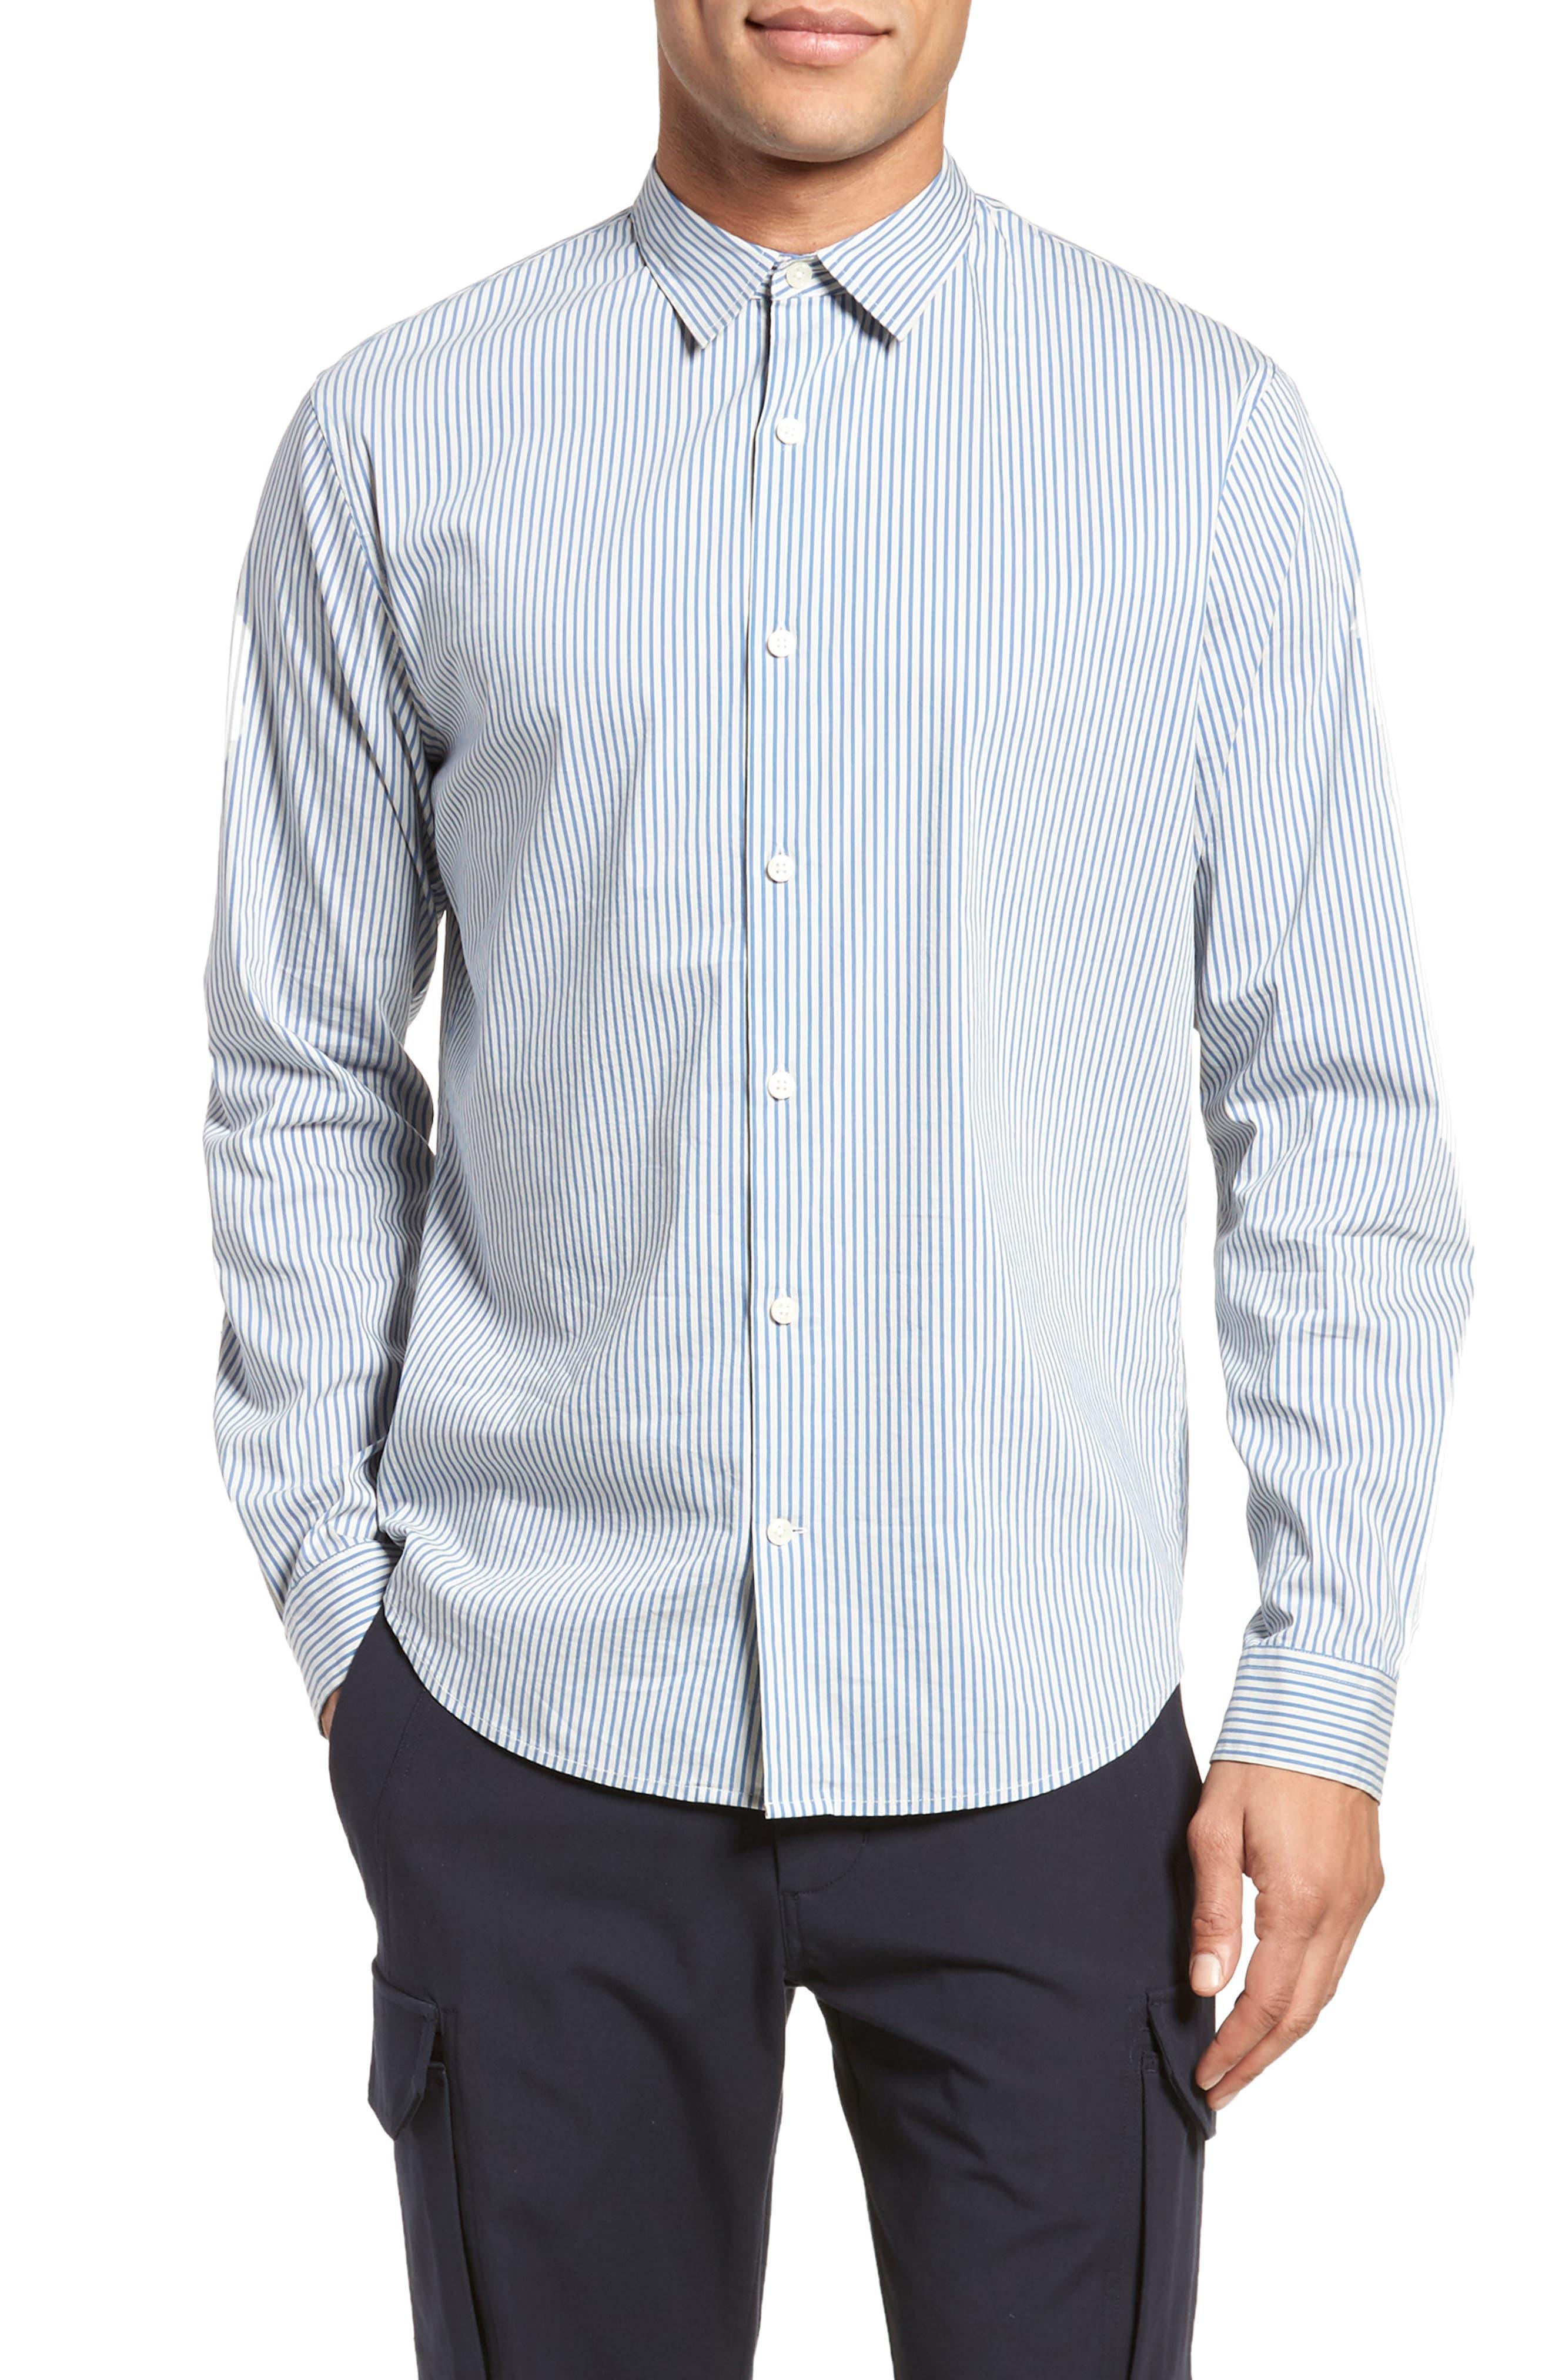 Regular Fit Stripe Sport Shirt,                         Main,                         color, White/ Ocean Blue